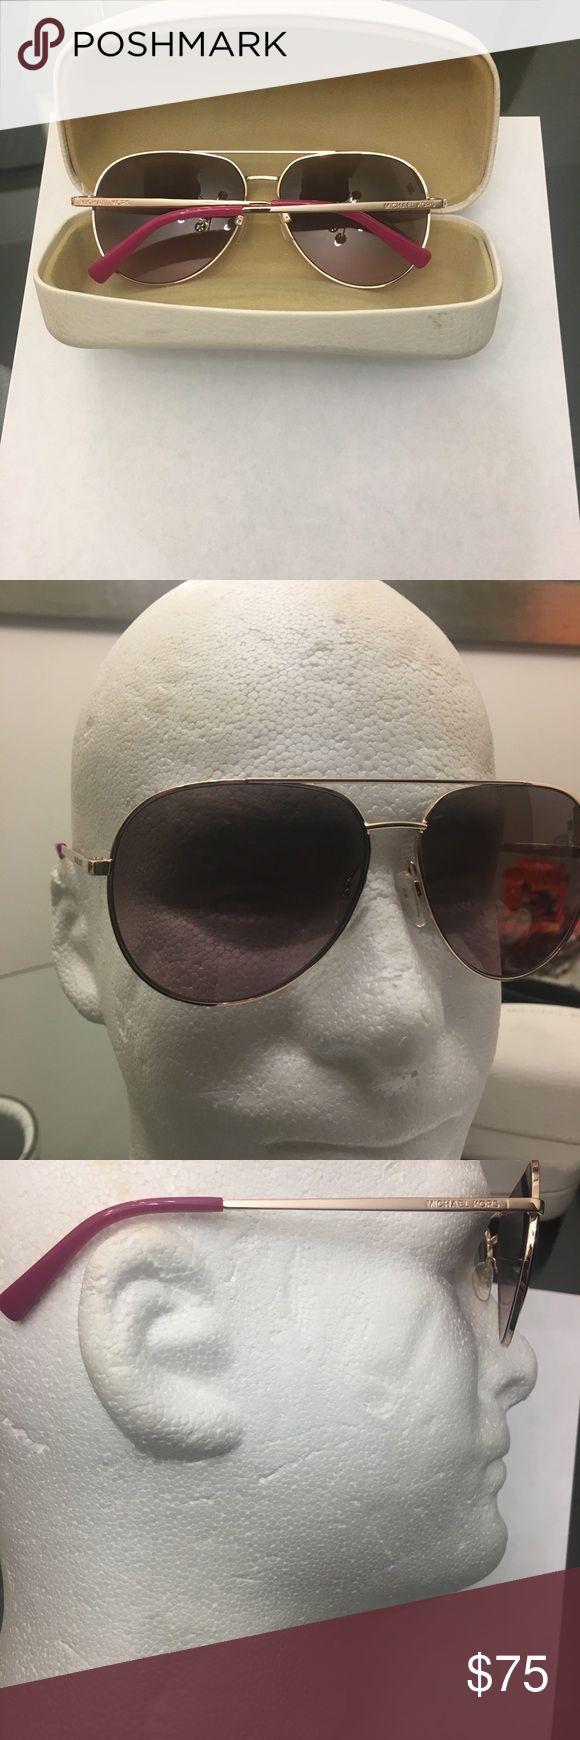 Michael Kors aviators woman sunglasses Michael Kors aviator sunglasses like new. case lil scuff up Michael Kors Accessories Glasses